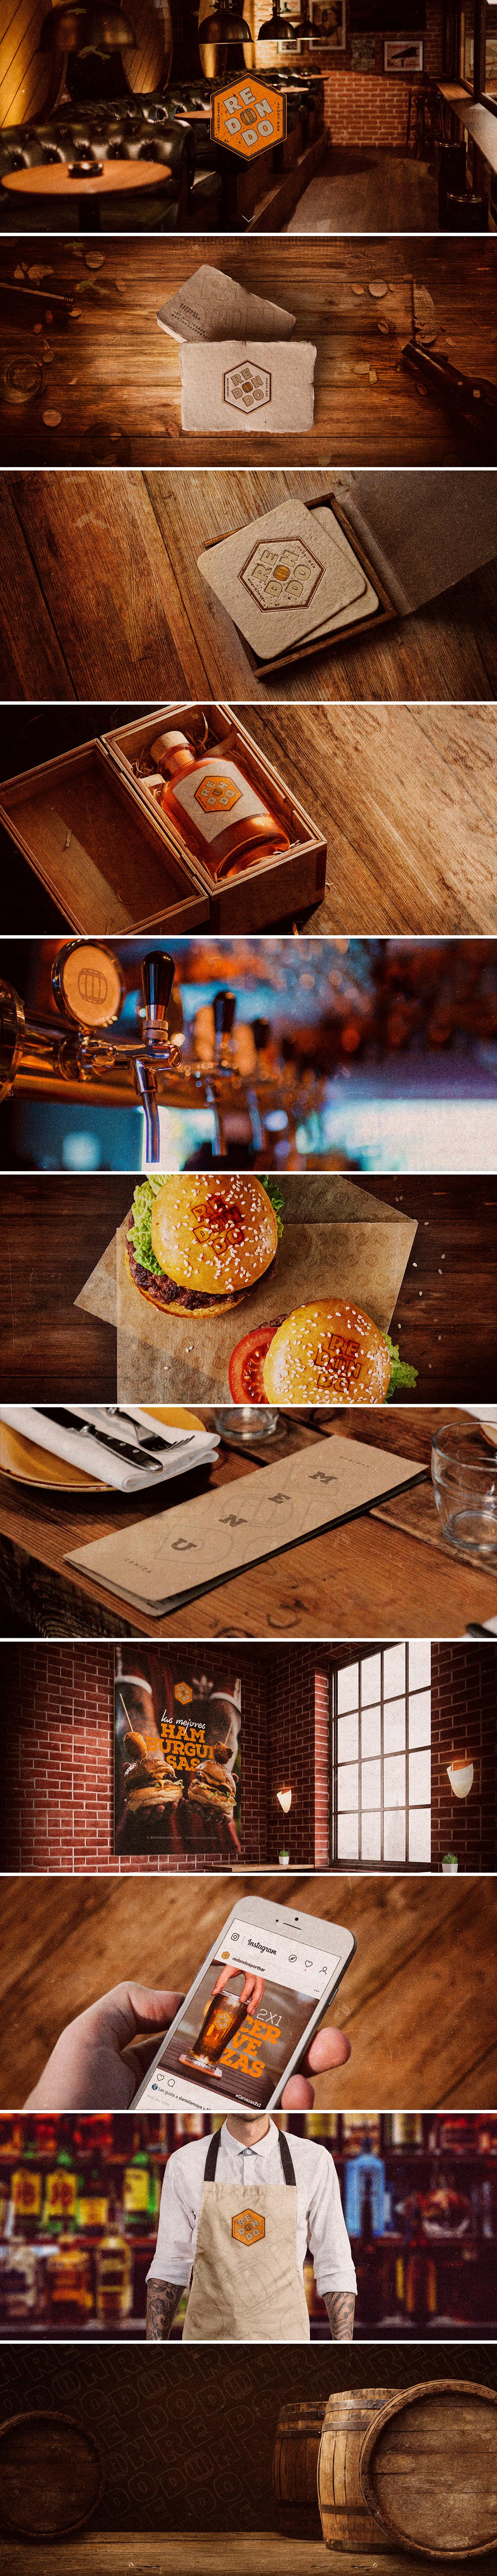 bar sport design beer burger creative